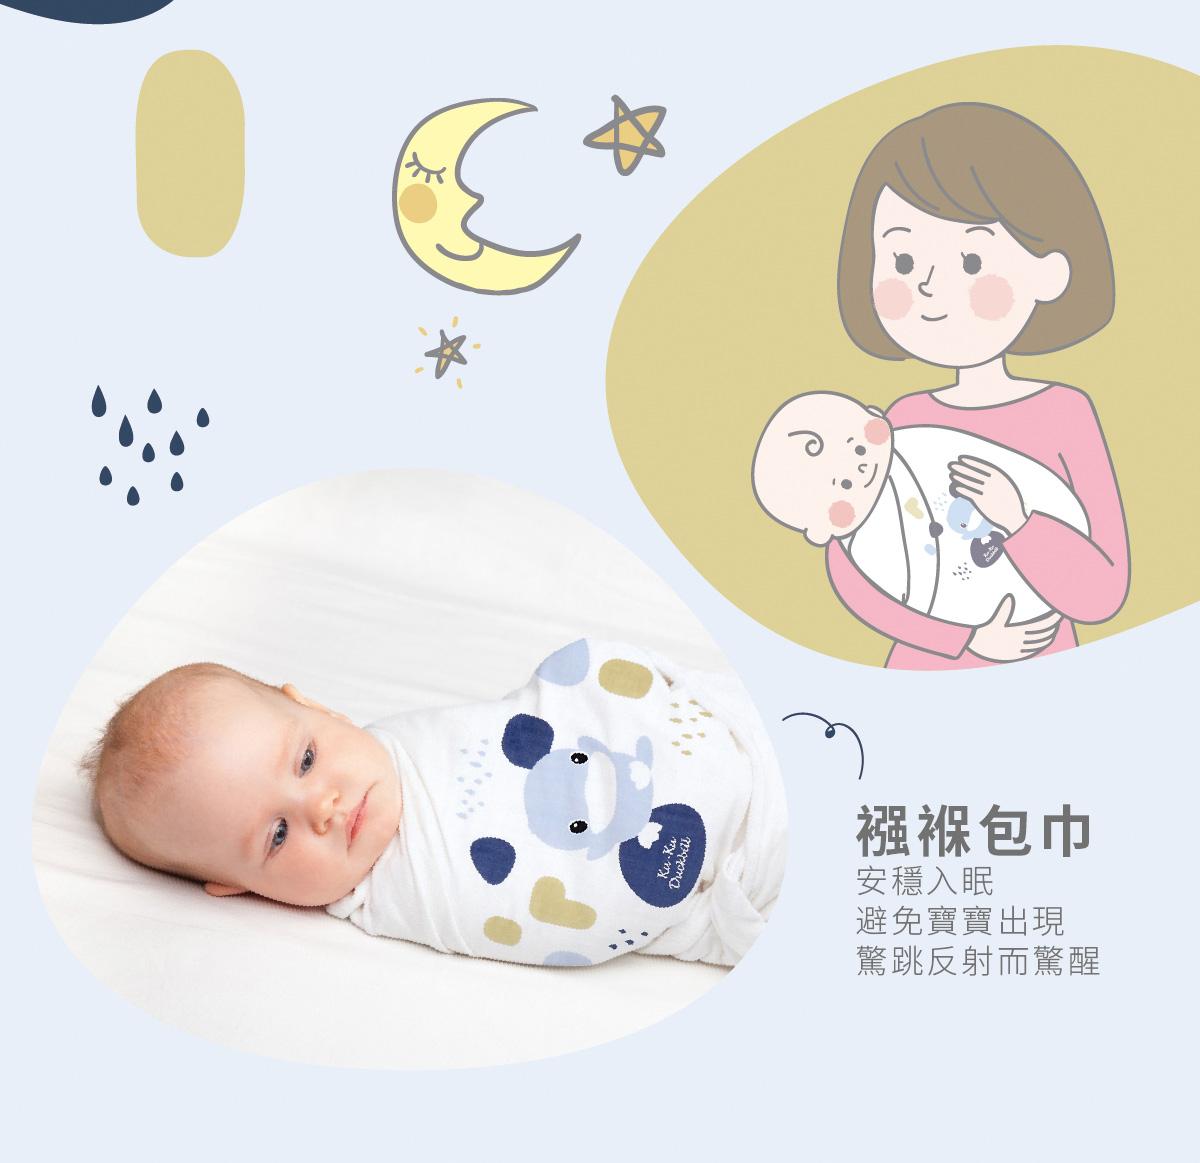 proimages/Cottons&BabyClothing/BabyClothesSeries/GauzeBathTowel/2394/2394-成長印記紗布大浴巾EDM-5.jpg